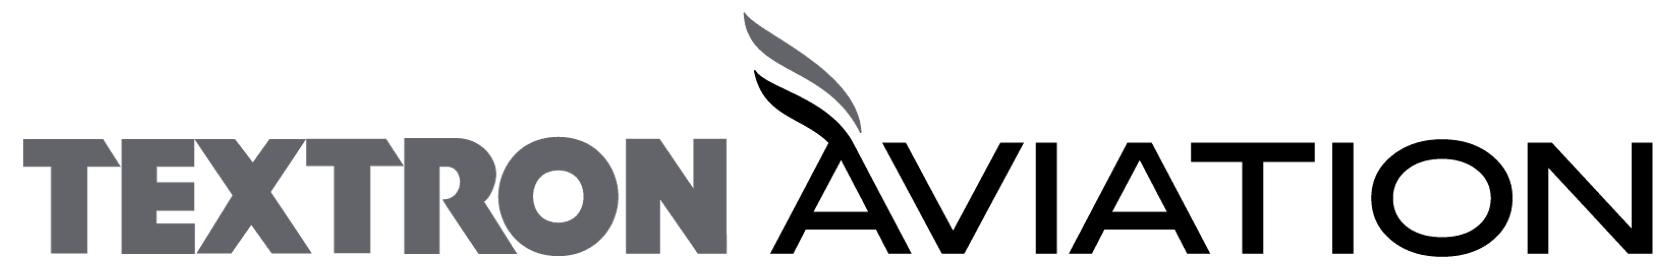 textron aviation � logos download